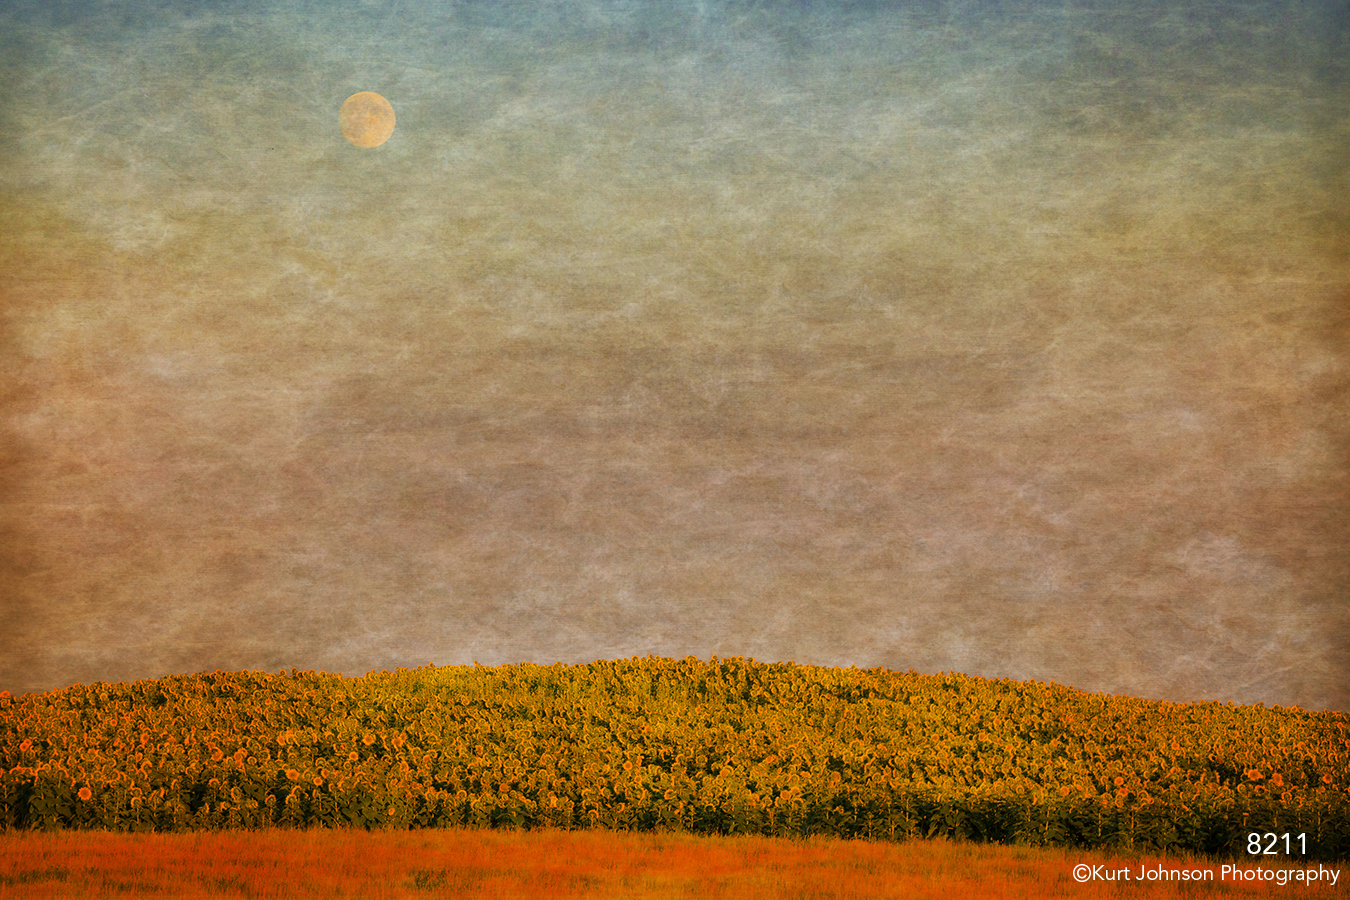 interpretations interpretation filter landscape sunset flowers sunflowers rural